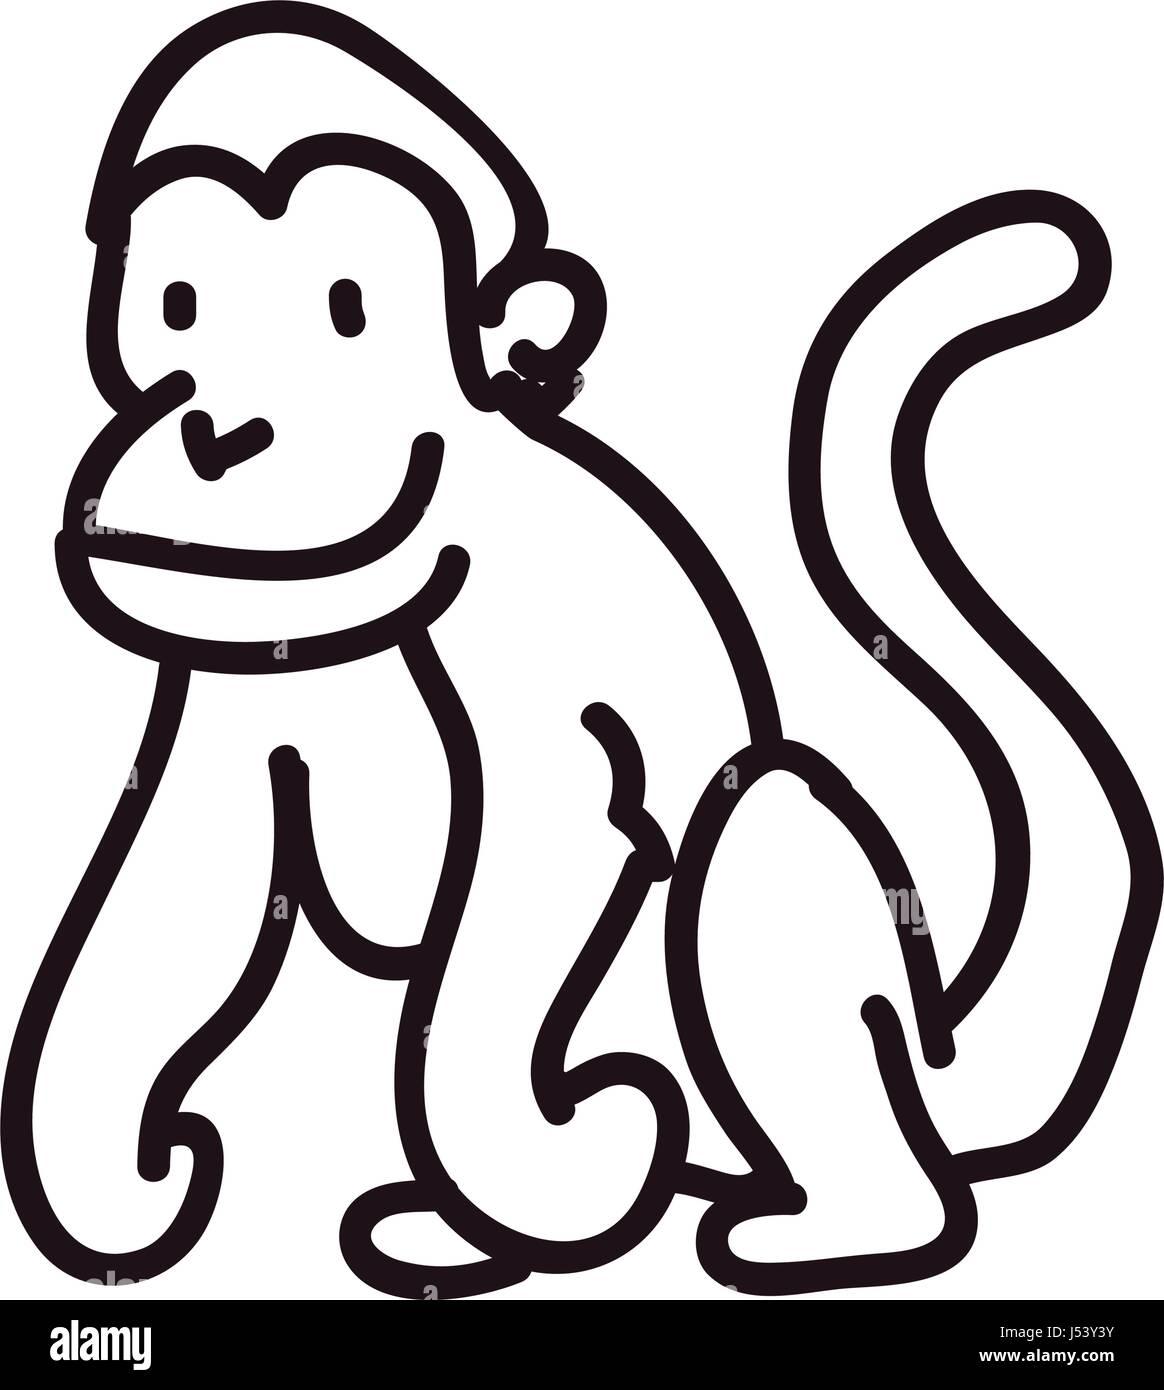 monkey doodle animal Stock Vector Art  for Line Drawing Monkey  8lpfiz